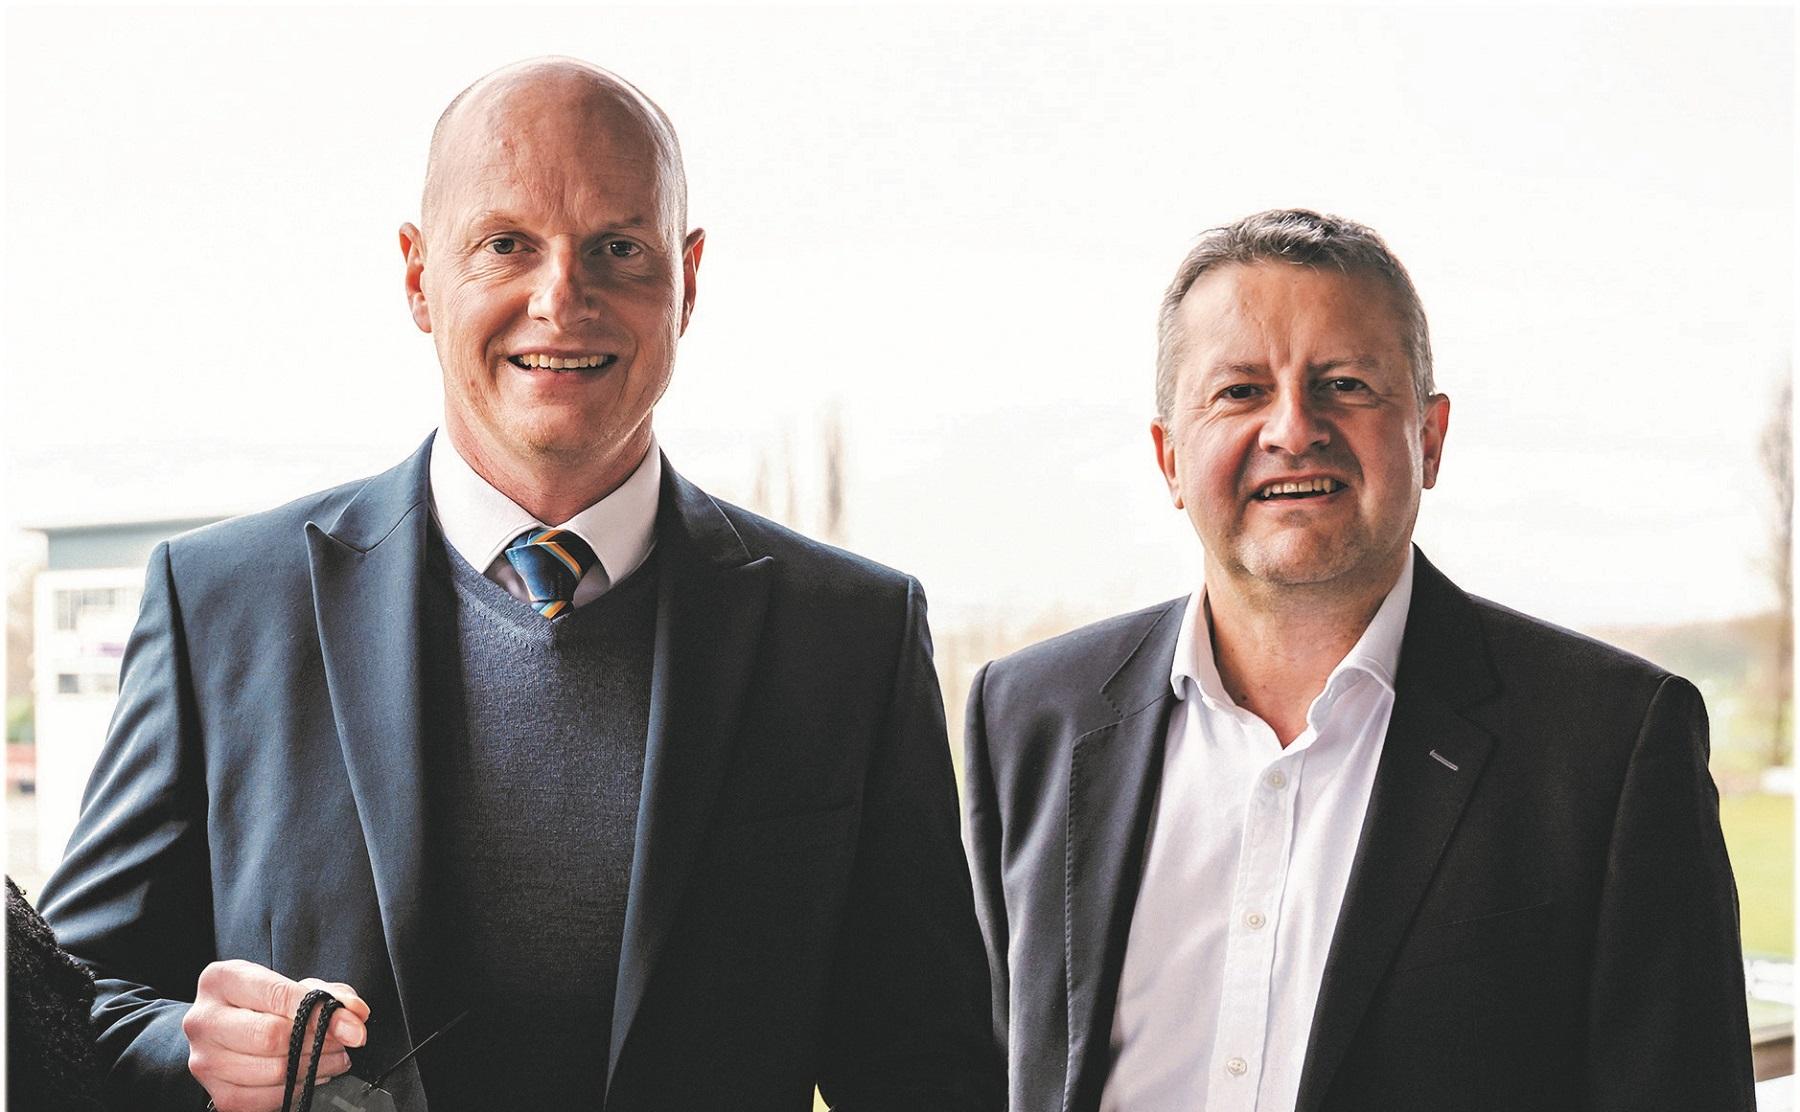 Derbyshire CCC renews partnership with Yappl